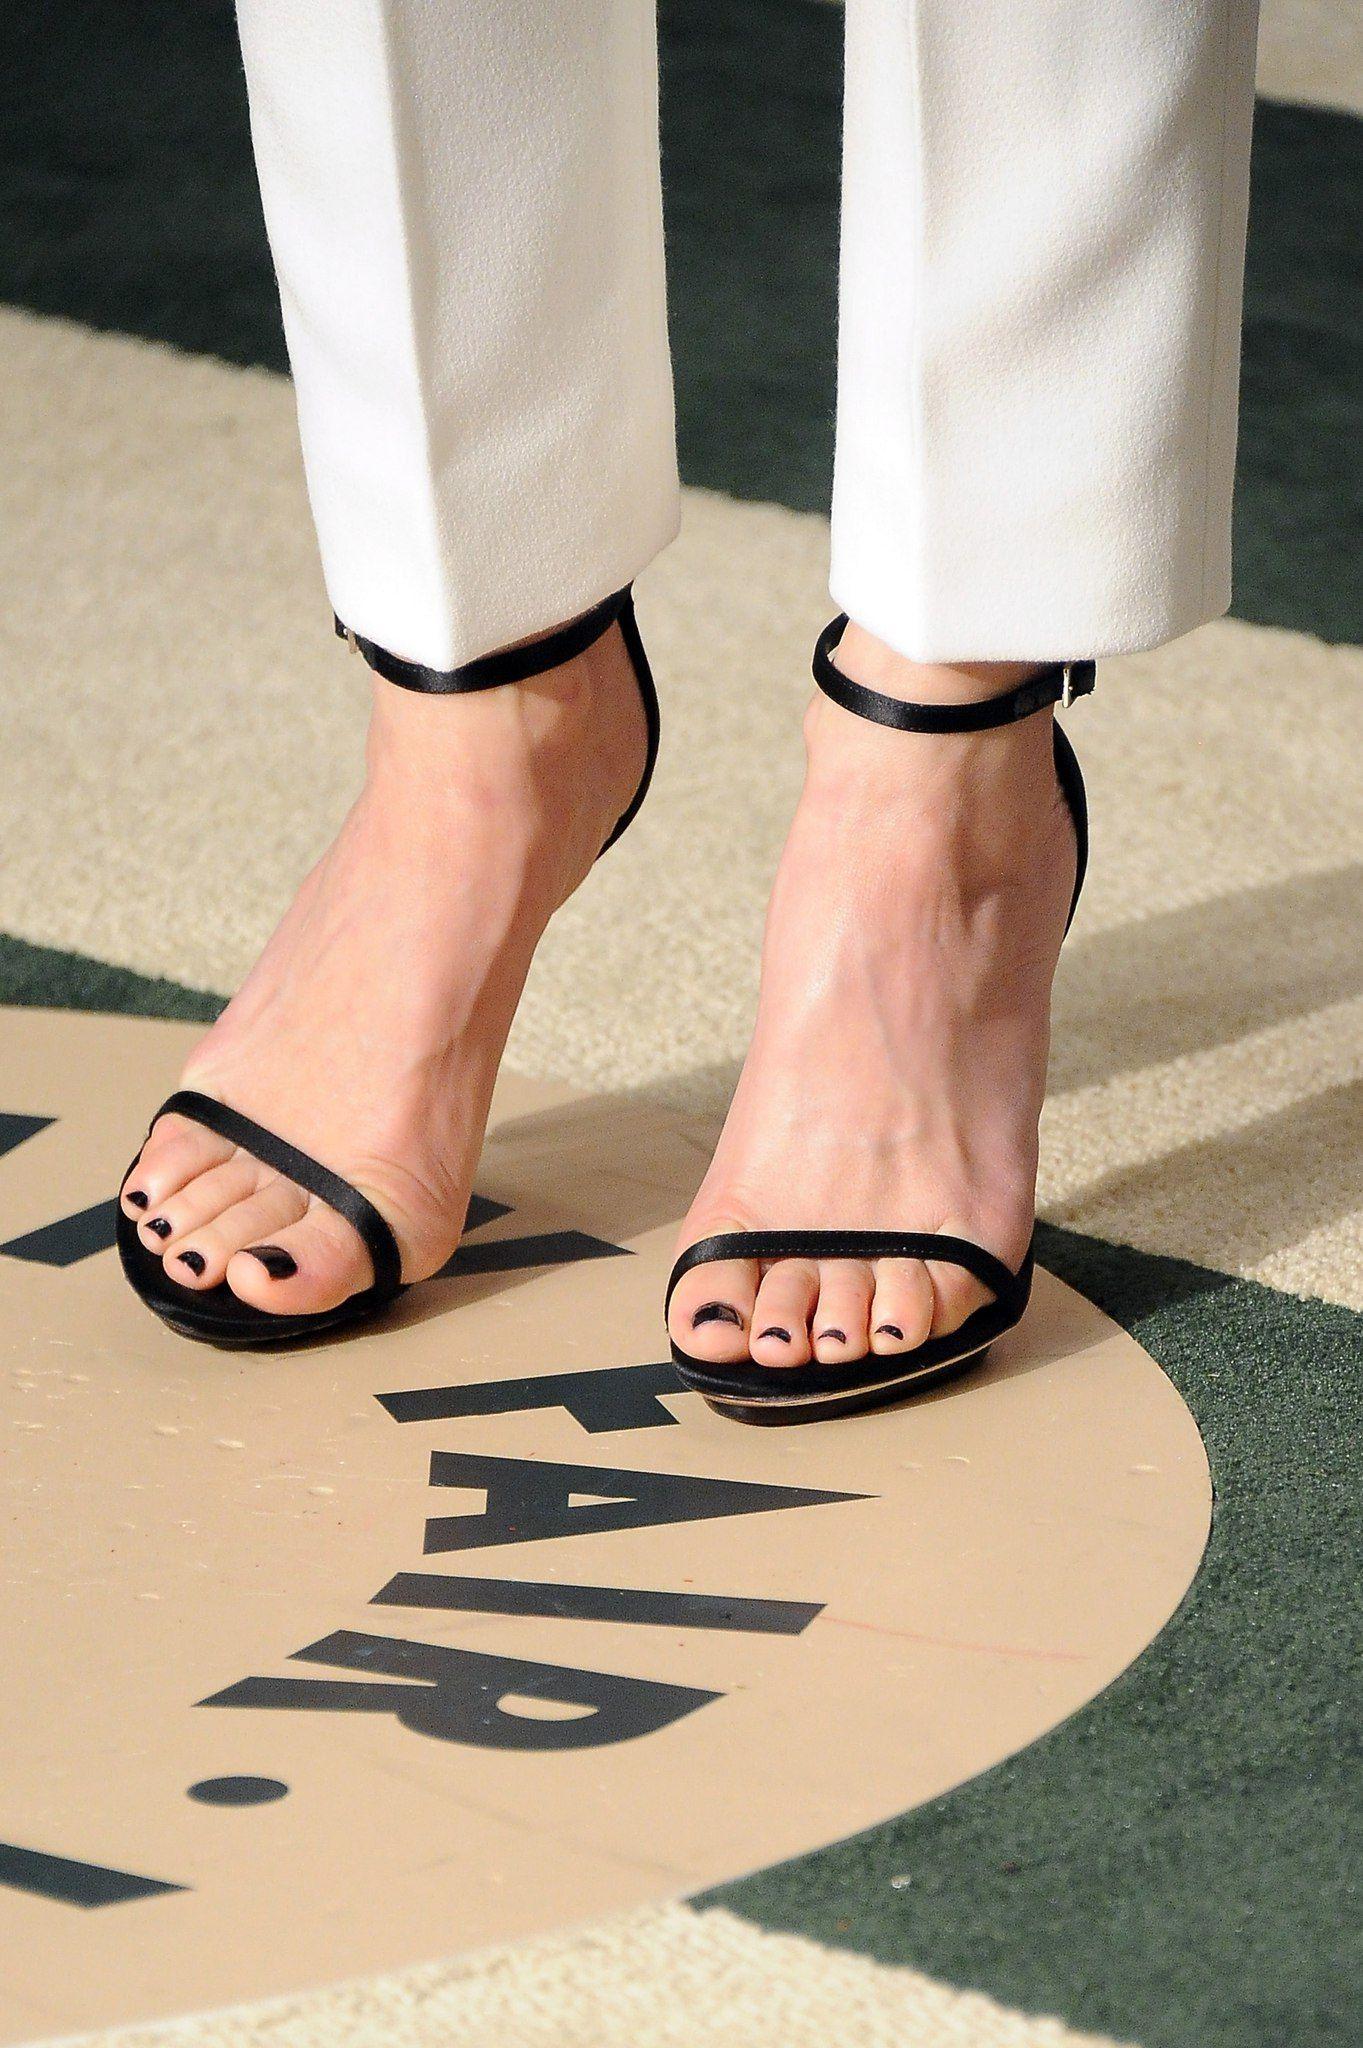 Naomi Watts Feet 1915317 Jpg Imagen Jpeg 1363 215 2048